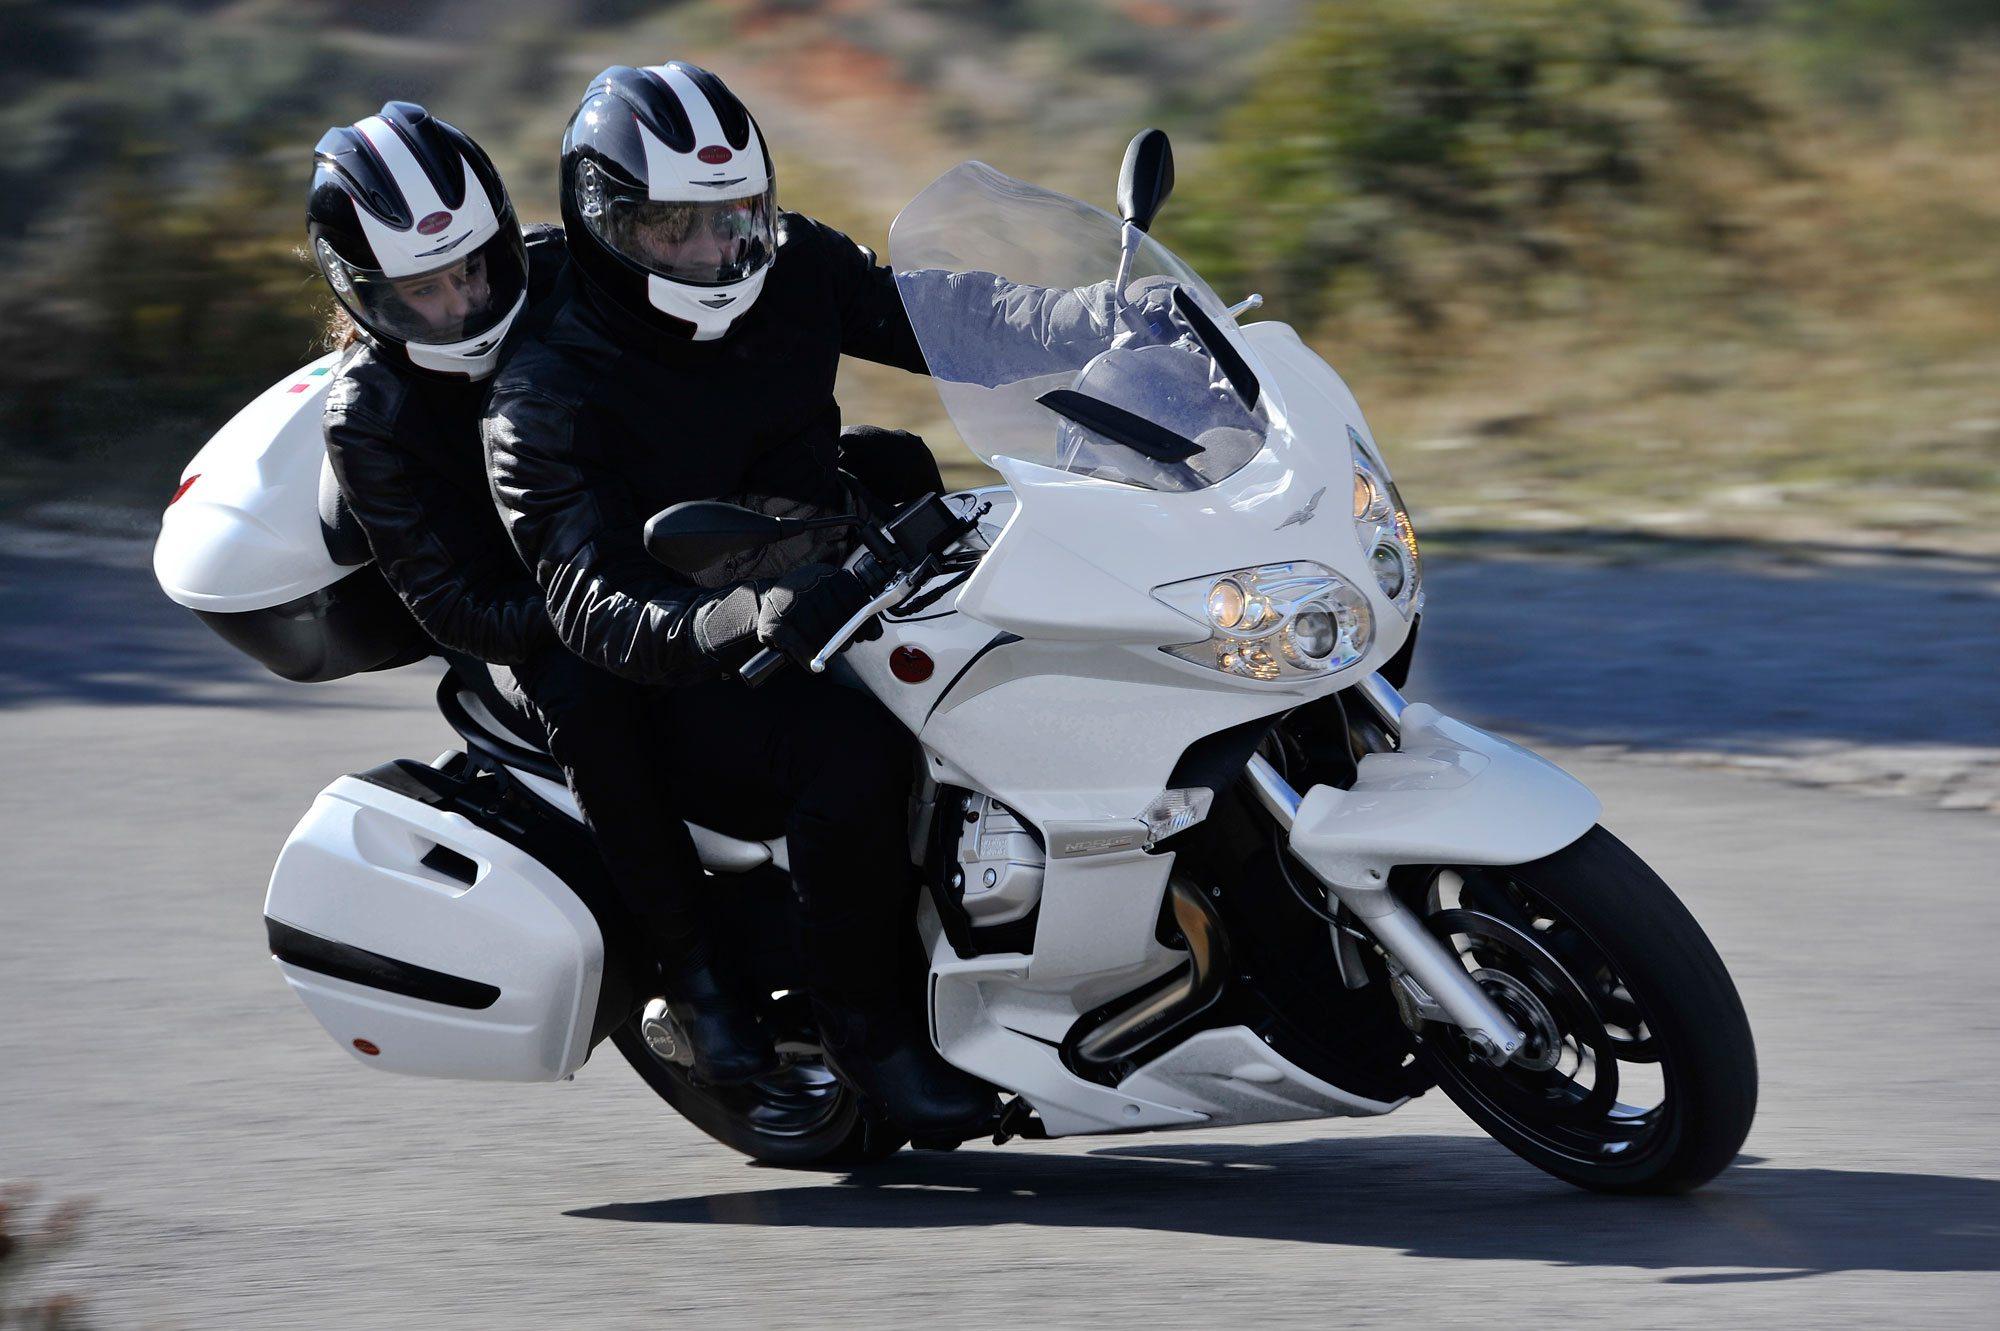 Moto Guzzi Norge turn